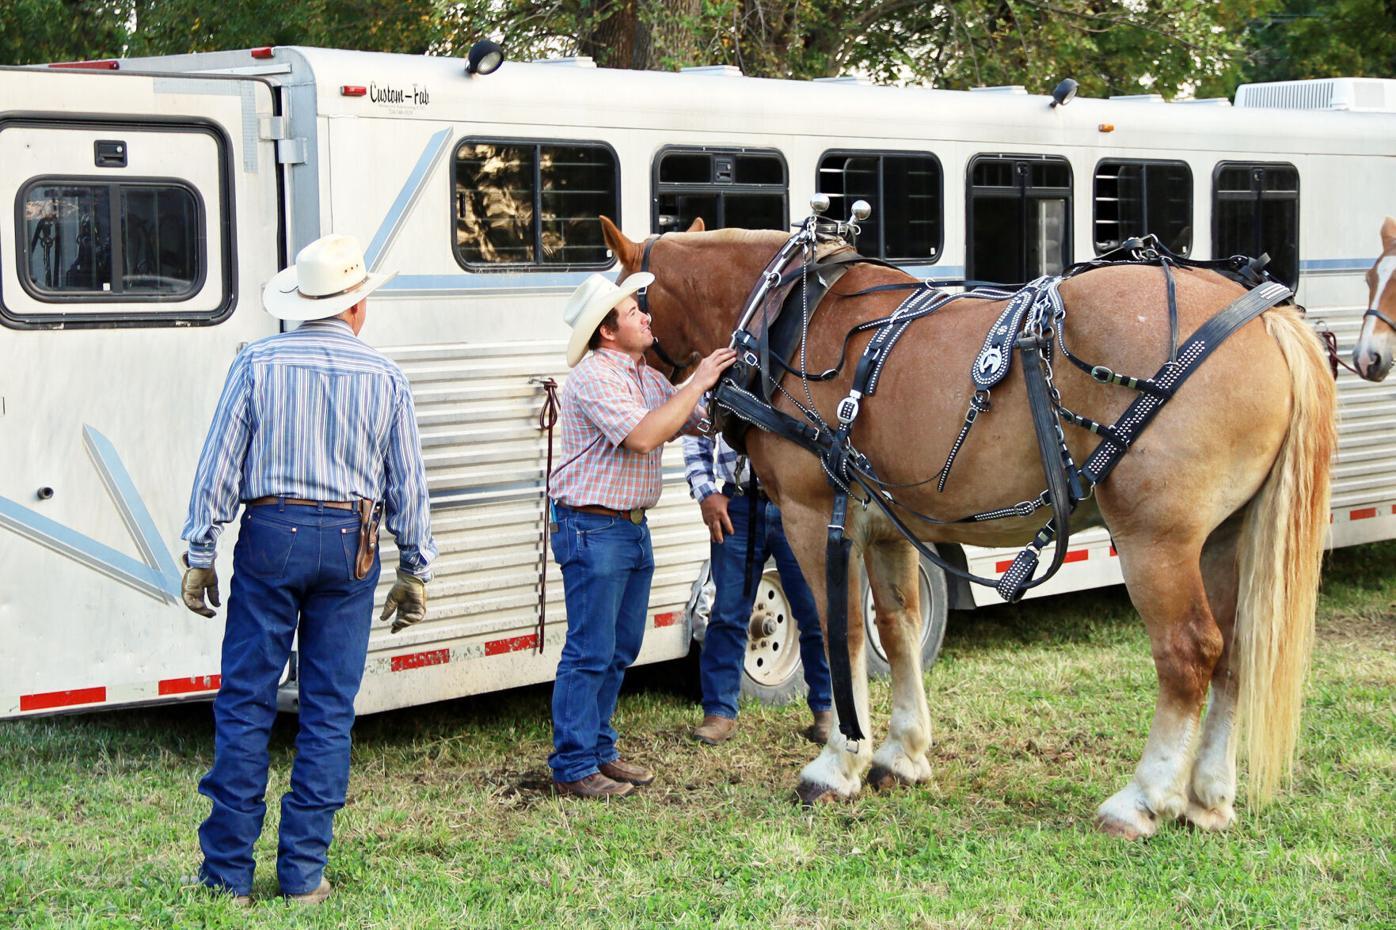 9-9-21 Pickering Horse Show 2.jpg